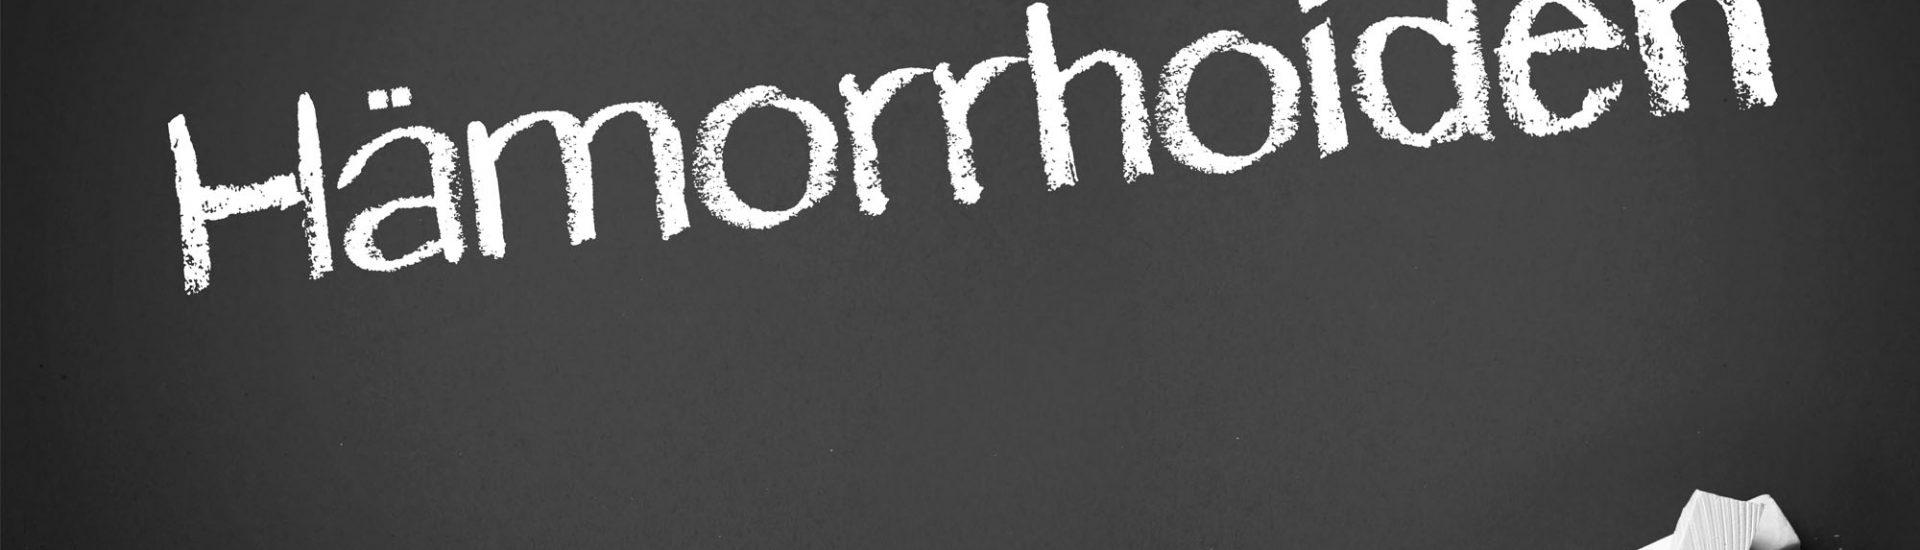 Hämorrhoiden: Symptome, Ursachen, Diagnose & Behandlung